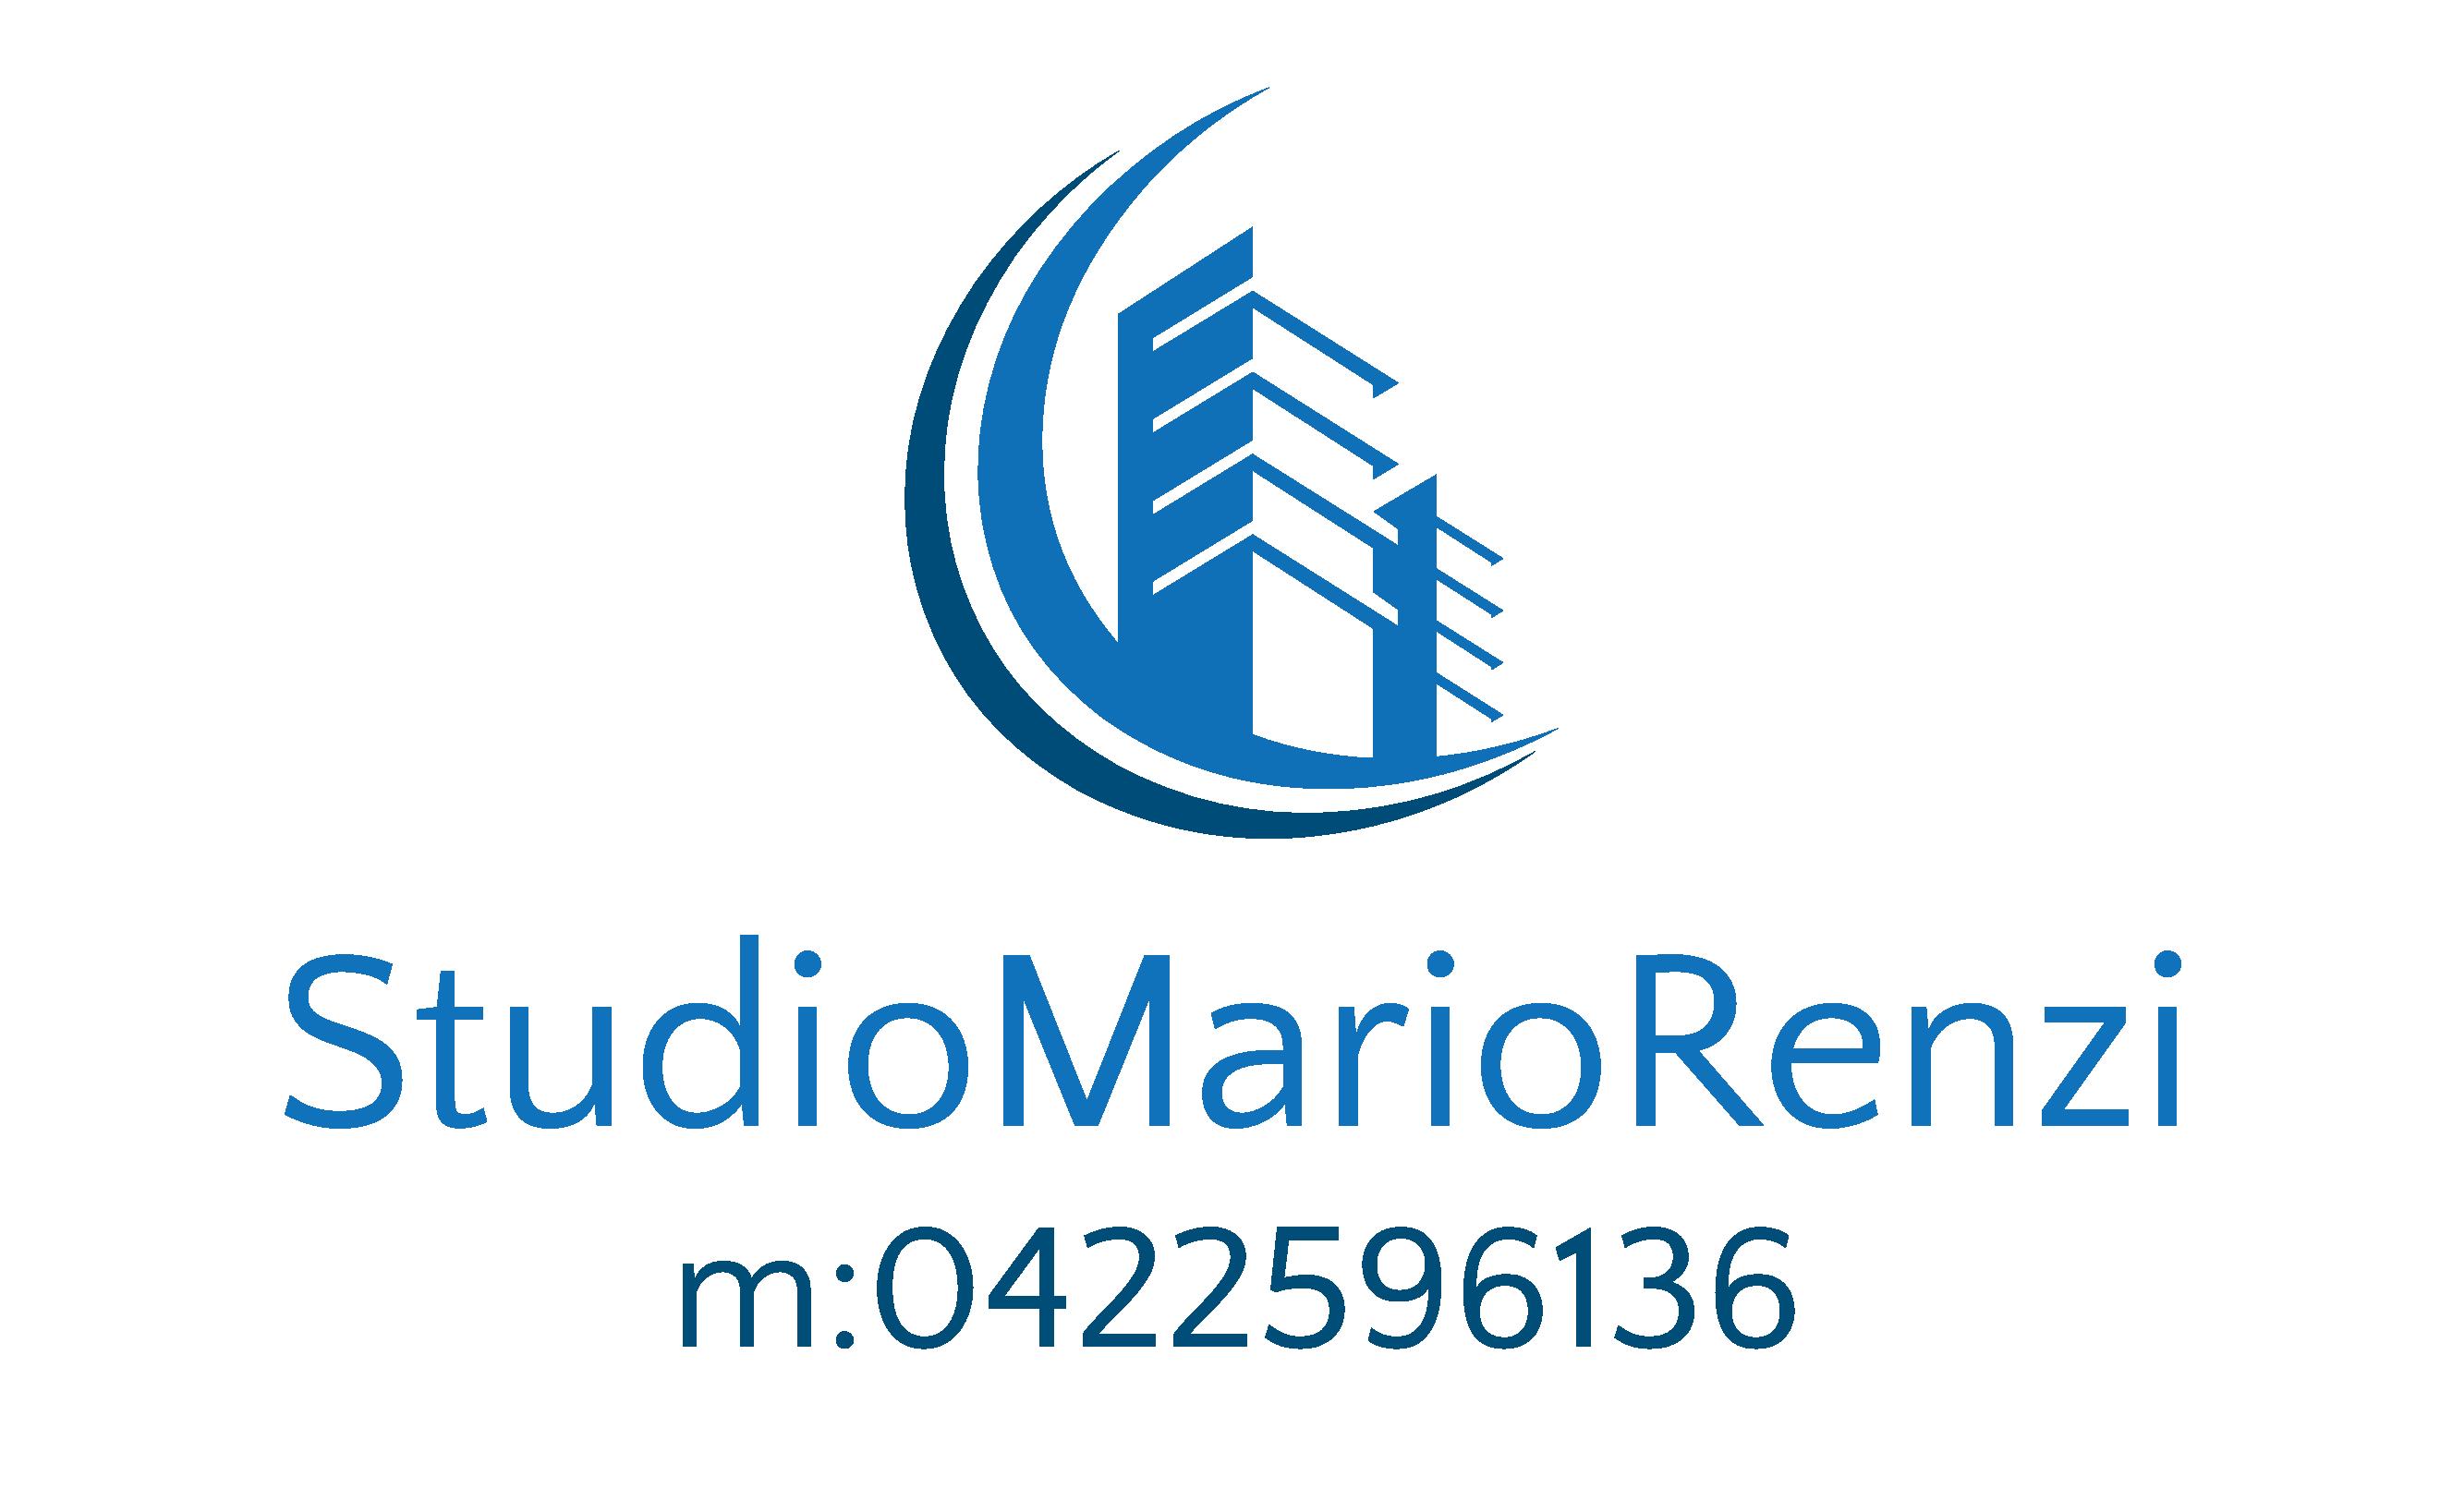 StudioMarioRenzi